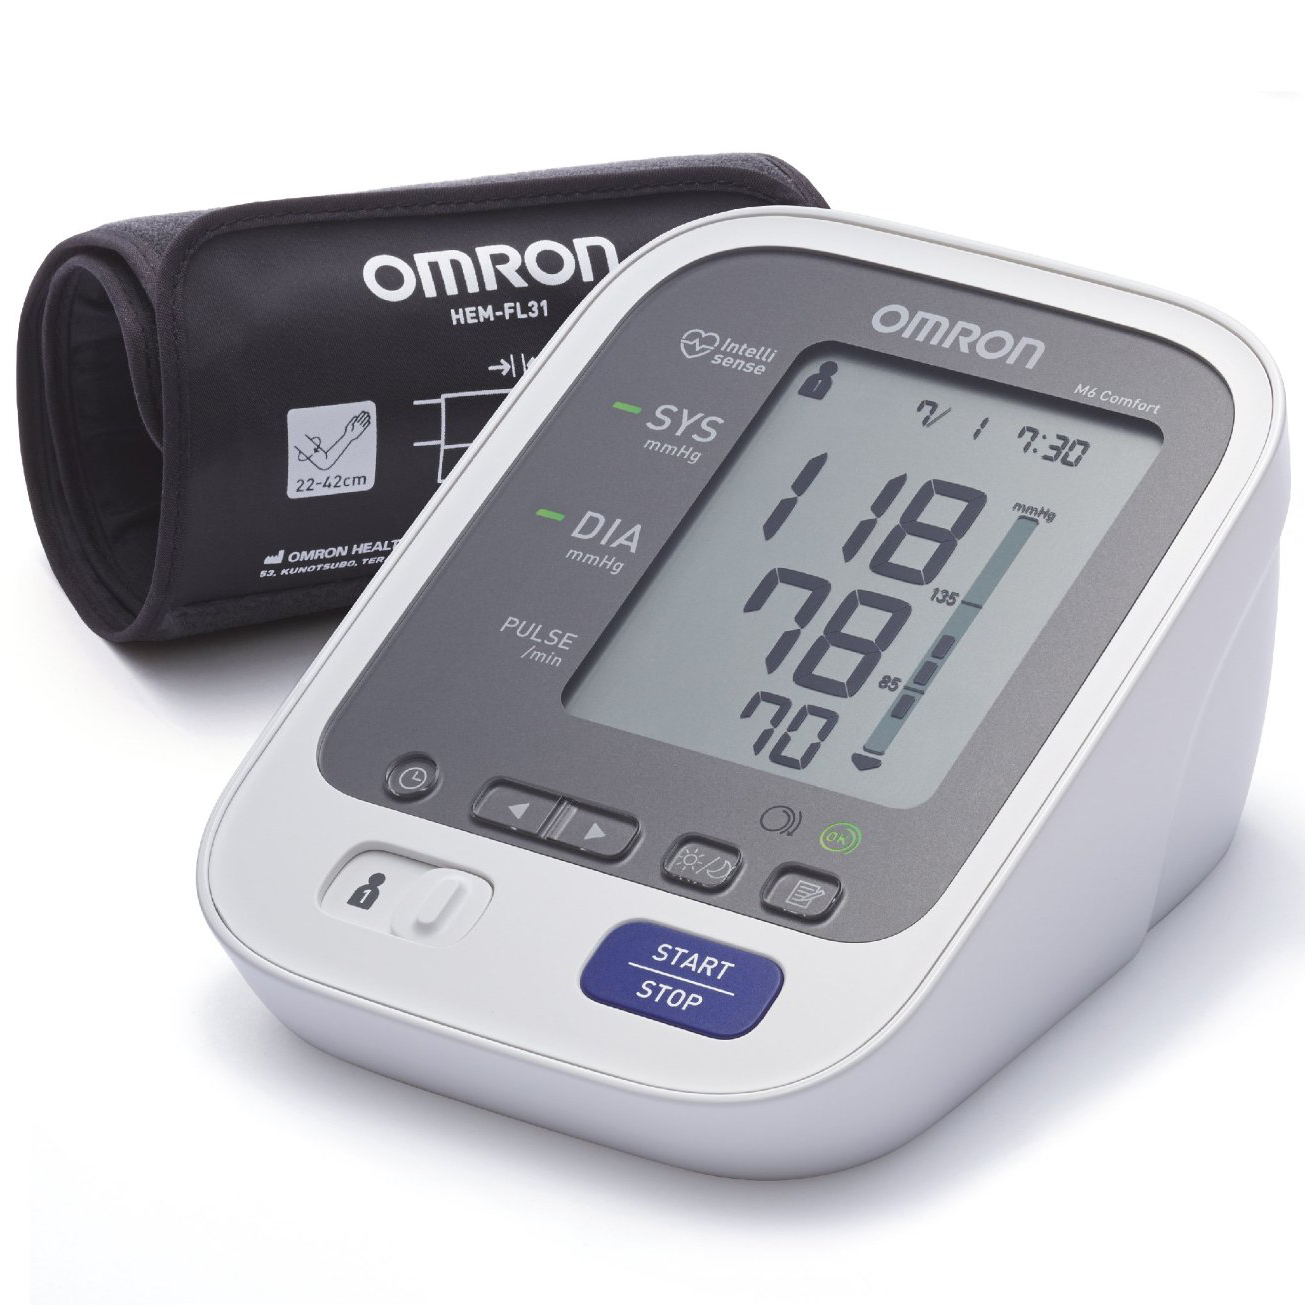 OMRON M6 Comfort Αυτόματο Ψηφιακό Πιεσόμετρο Μπράτσου σετ   εκπτώσεις νοεμβρίου 2016